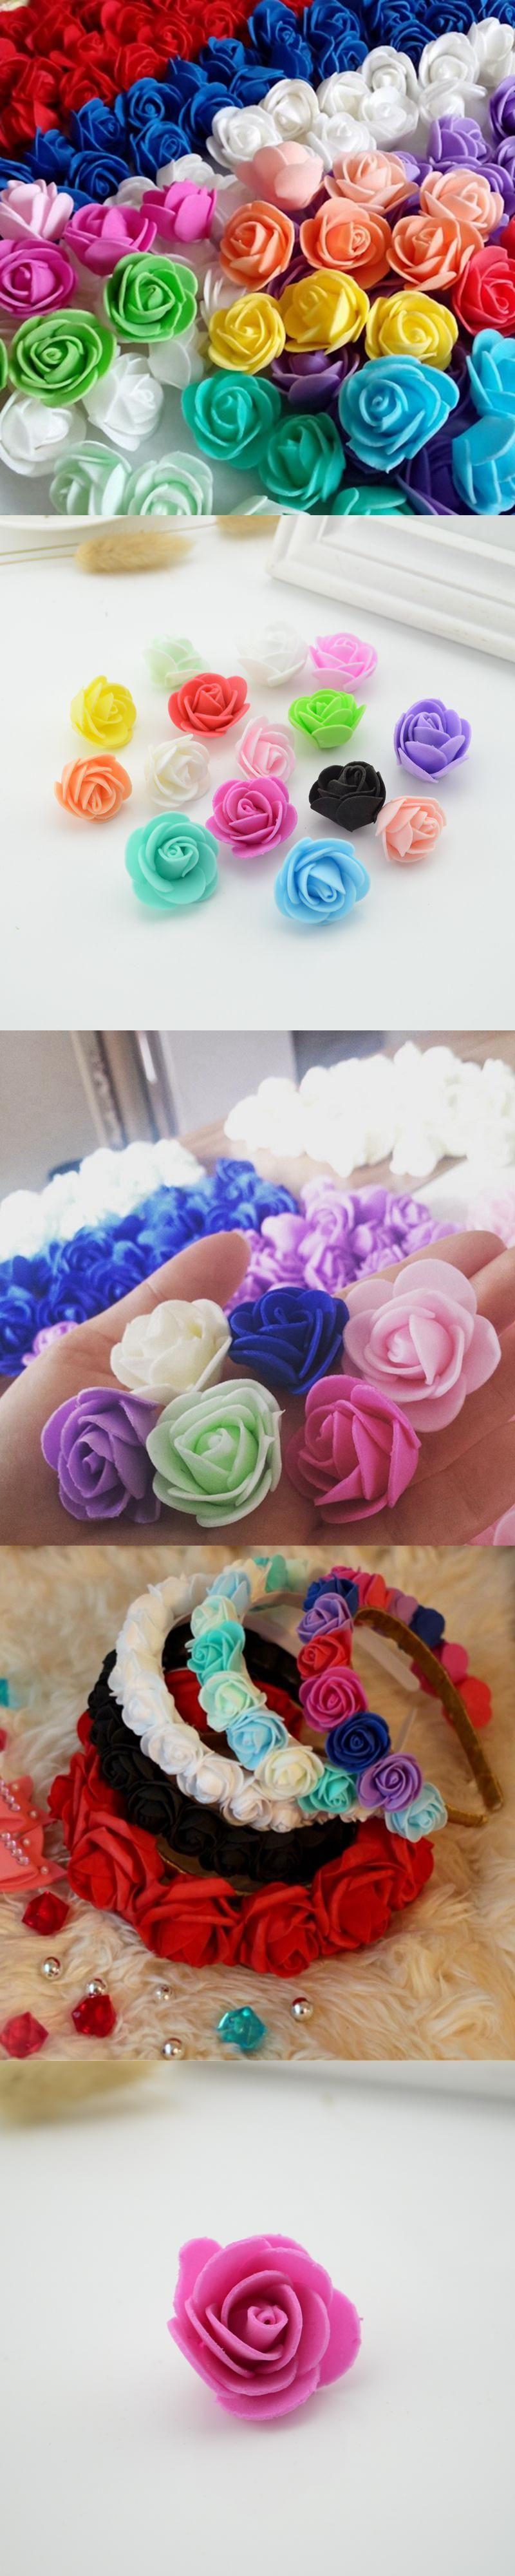 10pcs Mini Pe Foam Roses Artificial Flowers Cheap For Wedding Car